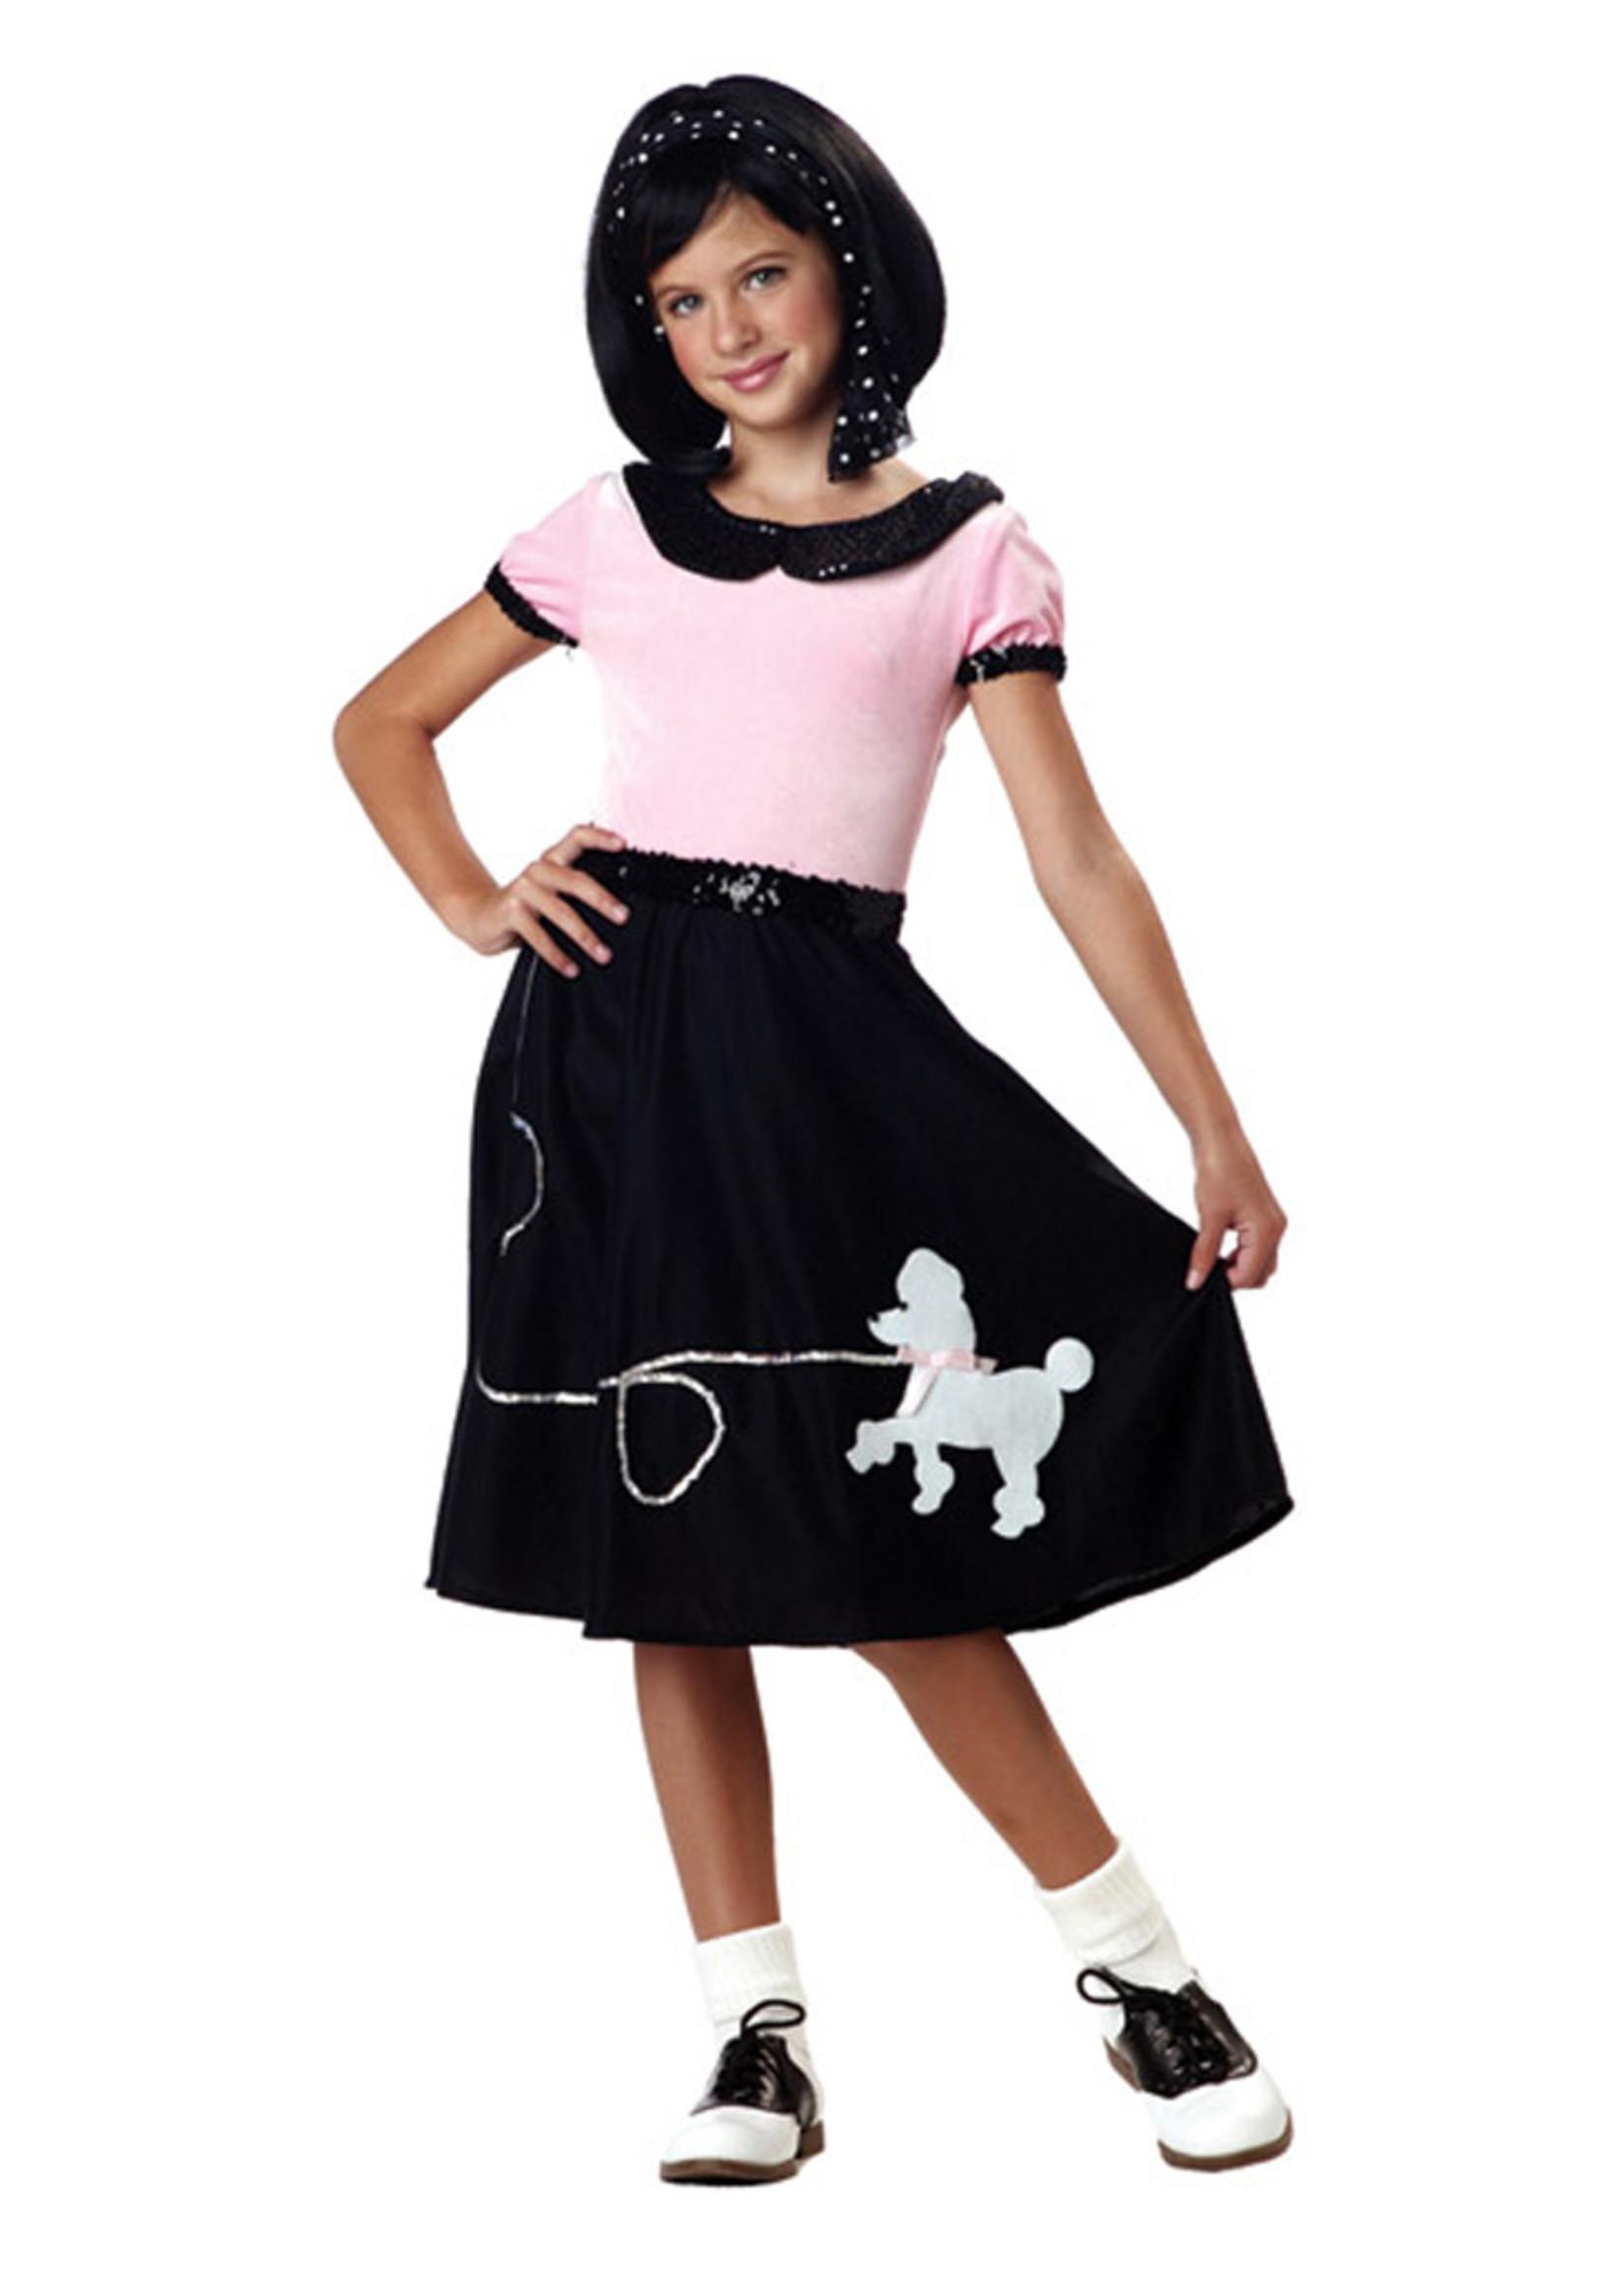 50's Hop w/ Poodle Skirt Costume - Girls